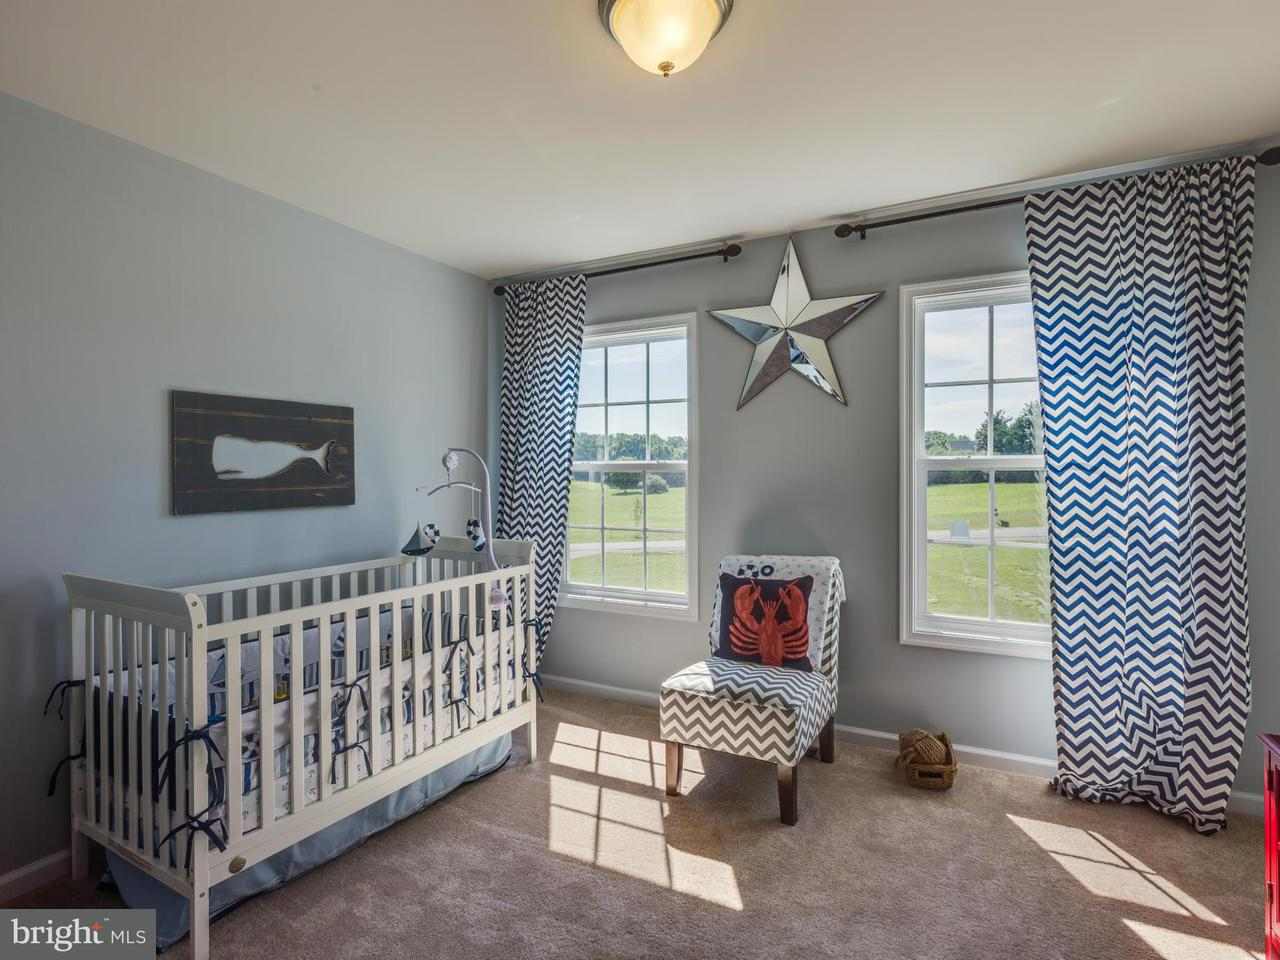 Additional photo for property listing at Cranes Corner Road Cranes Corner Road Fredericksburg, Виргиния 22405 Соединенные Штаты